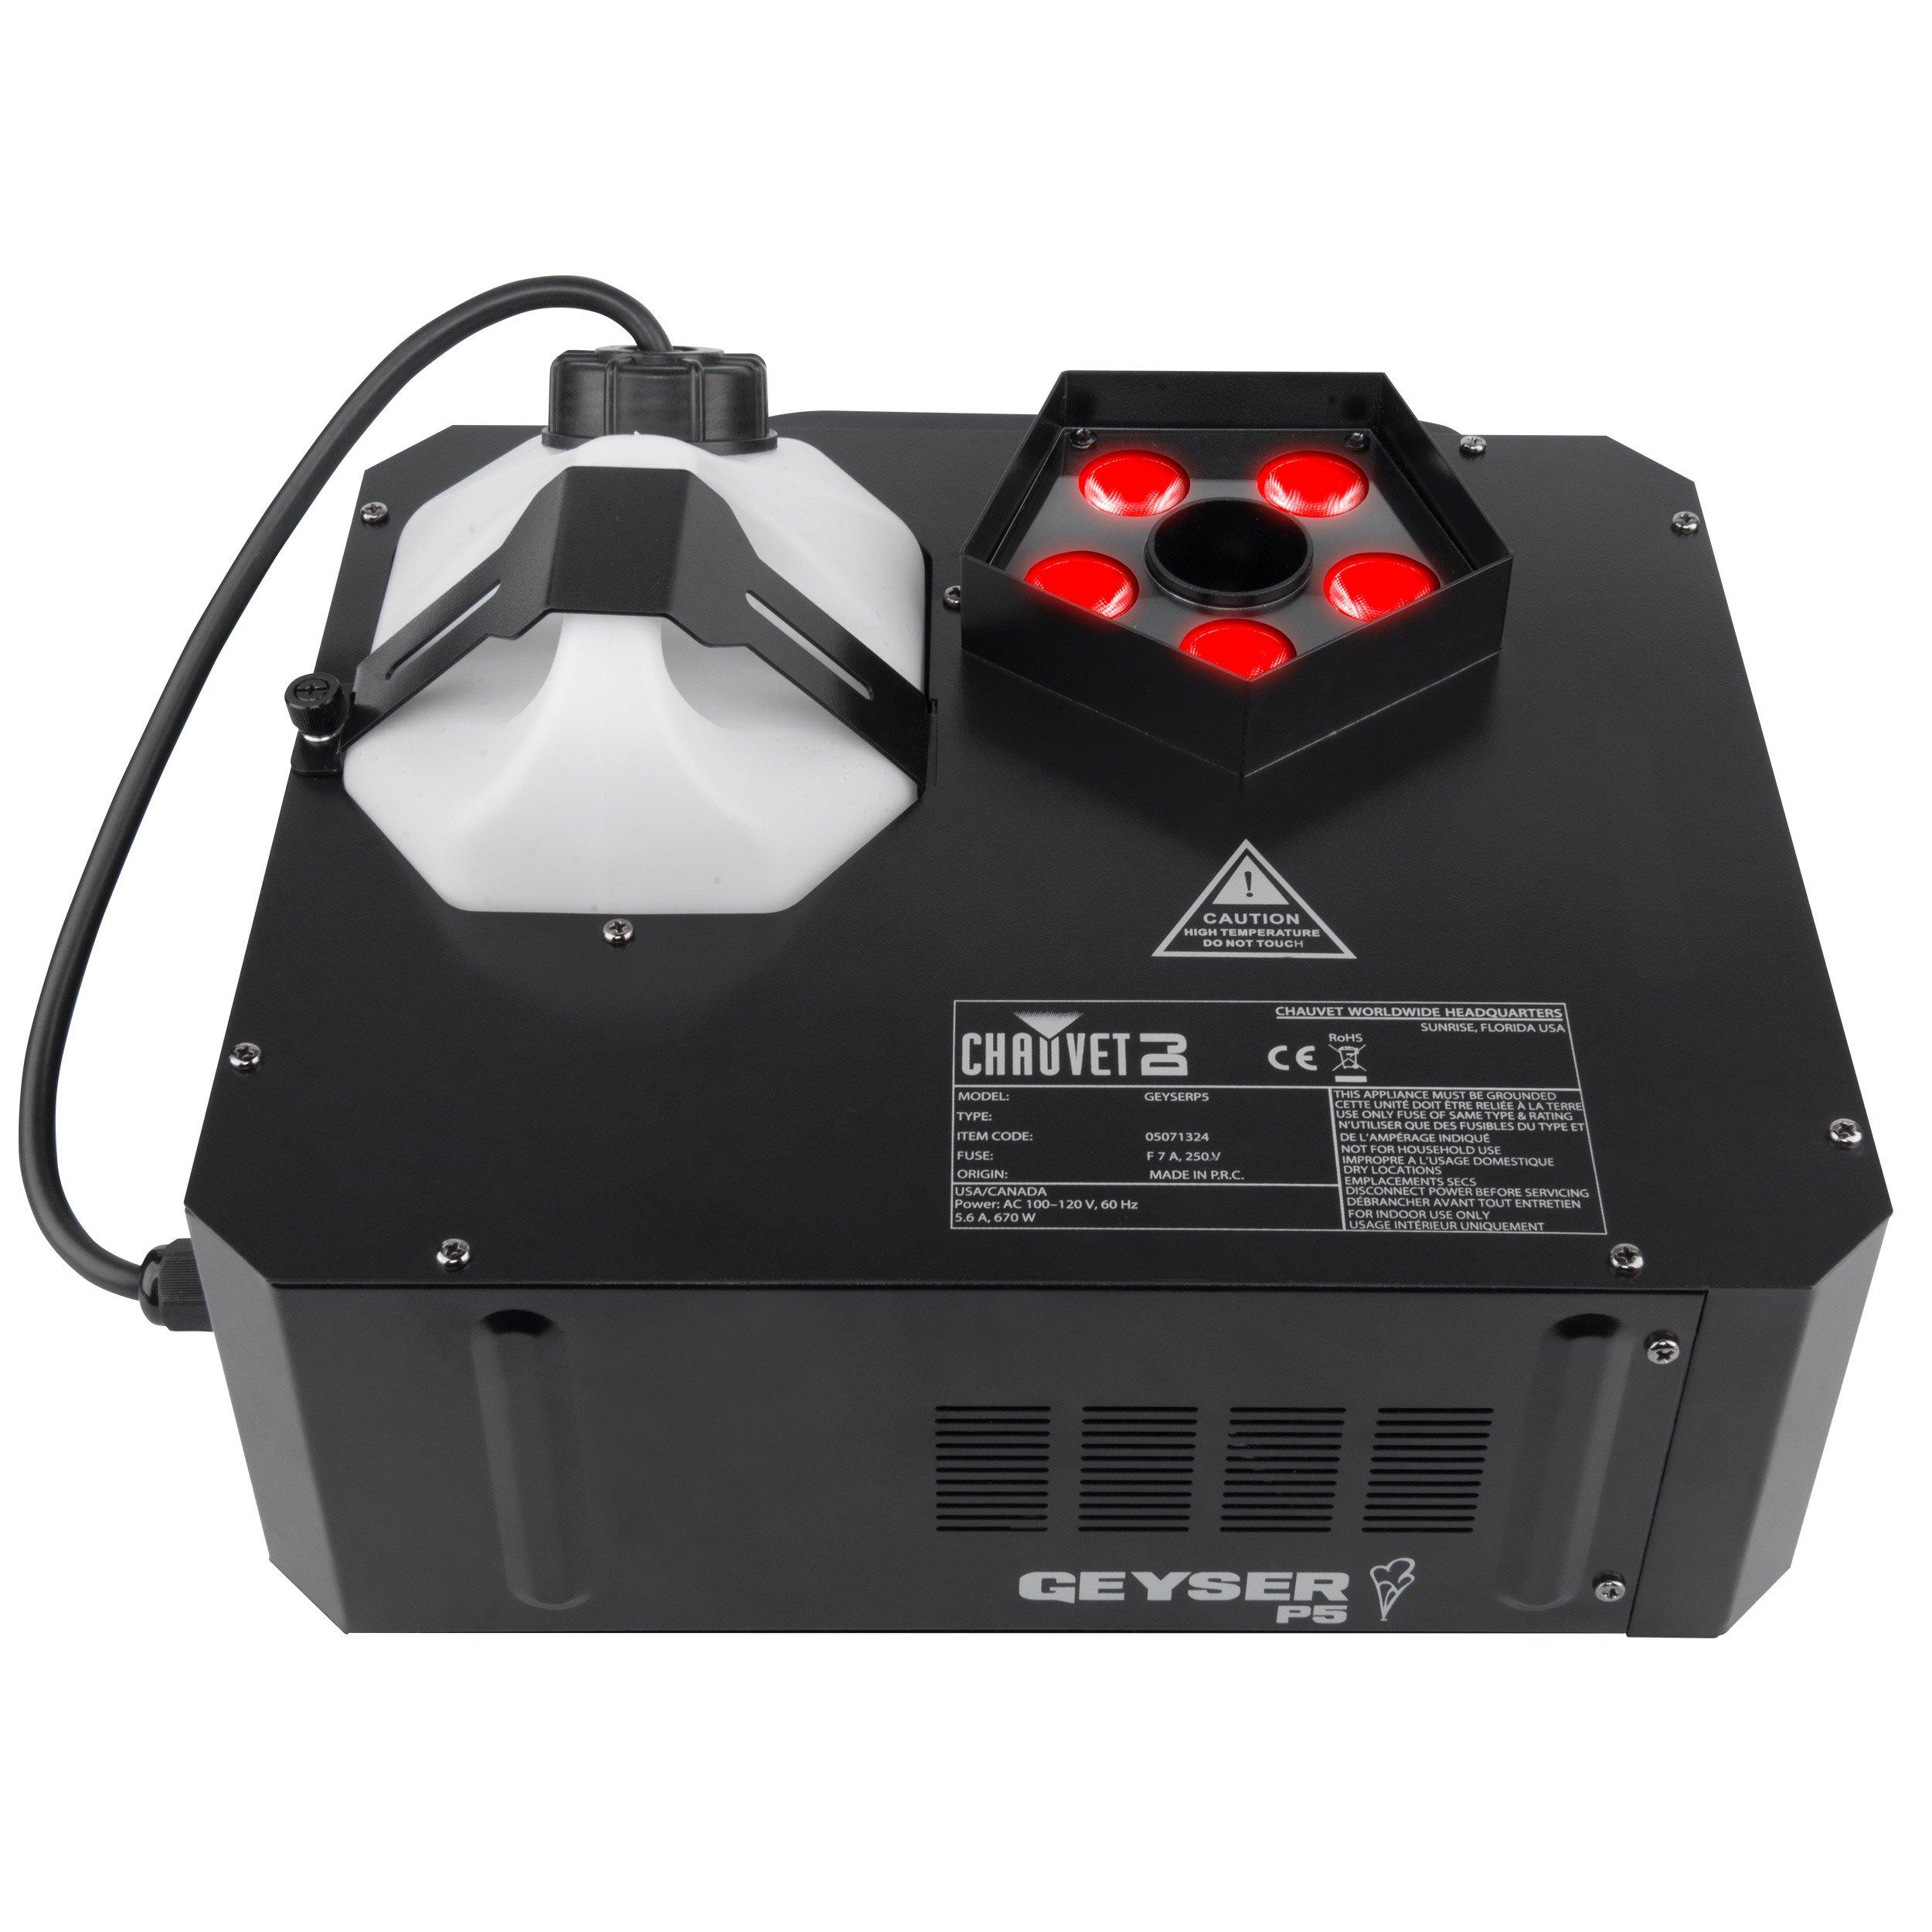 Chauvet DJ Geyser P5 RGBA+UV LED Pyrotechnic-Like Effect Fog Machine with 1 Year EverythingMusic Extended Warranty Free